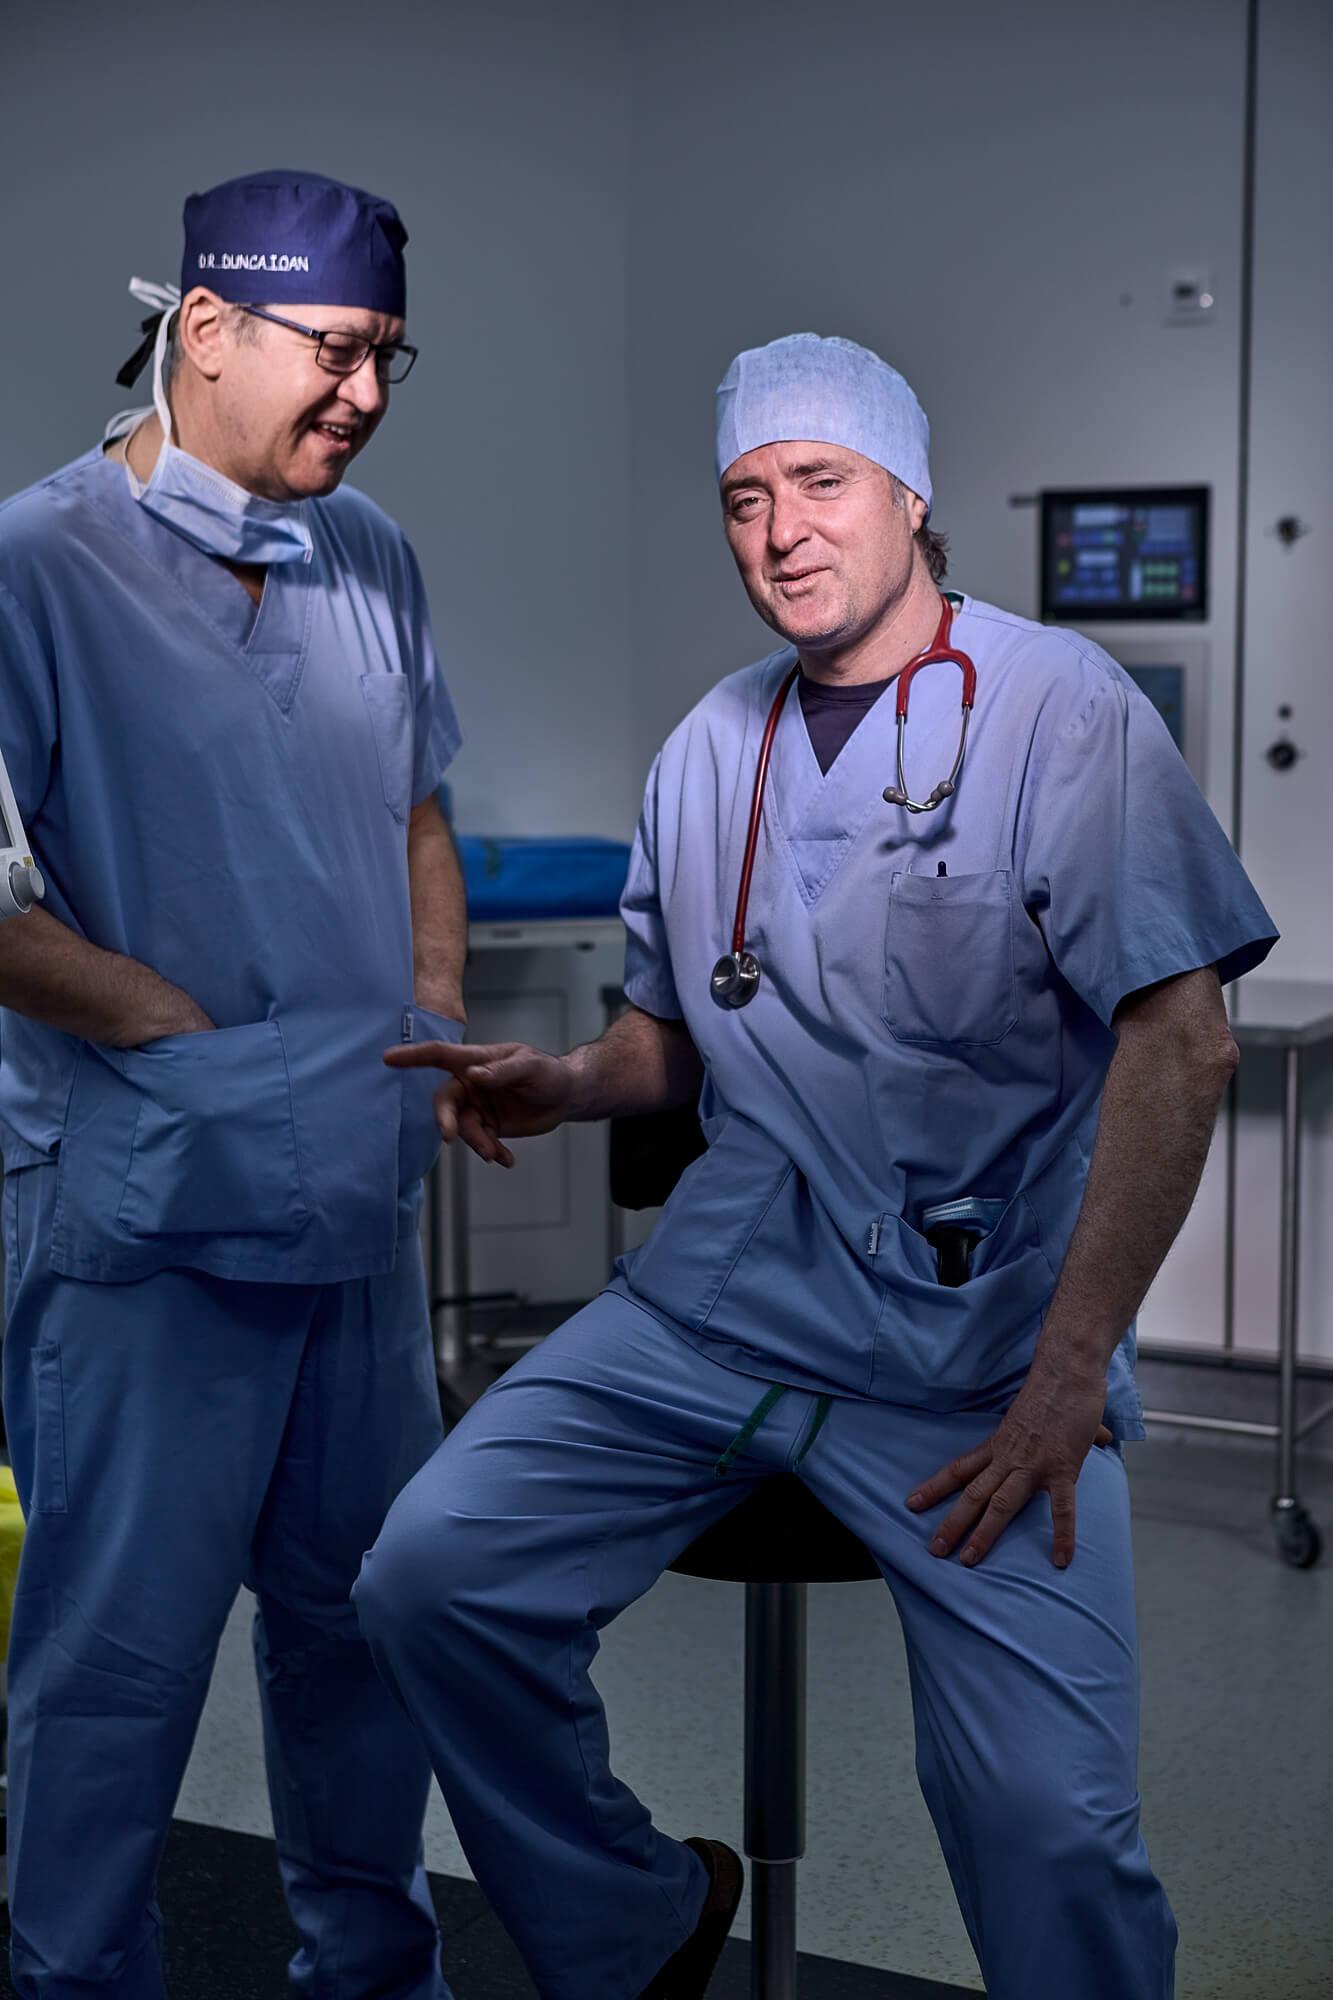 Dr. Ioan Dunca with Dr. Pau anaesthologist